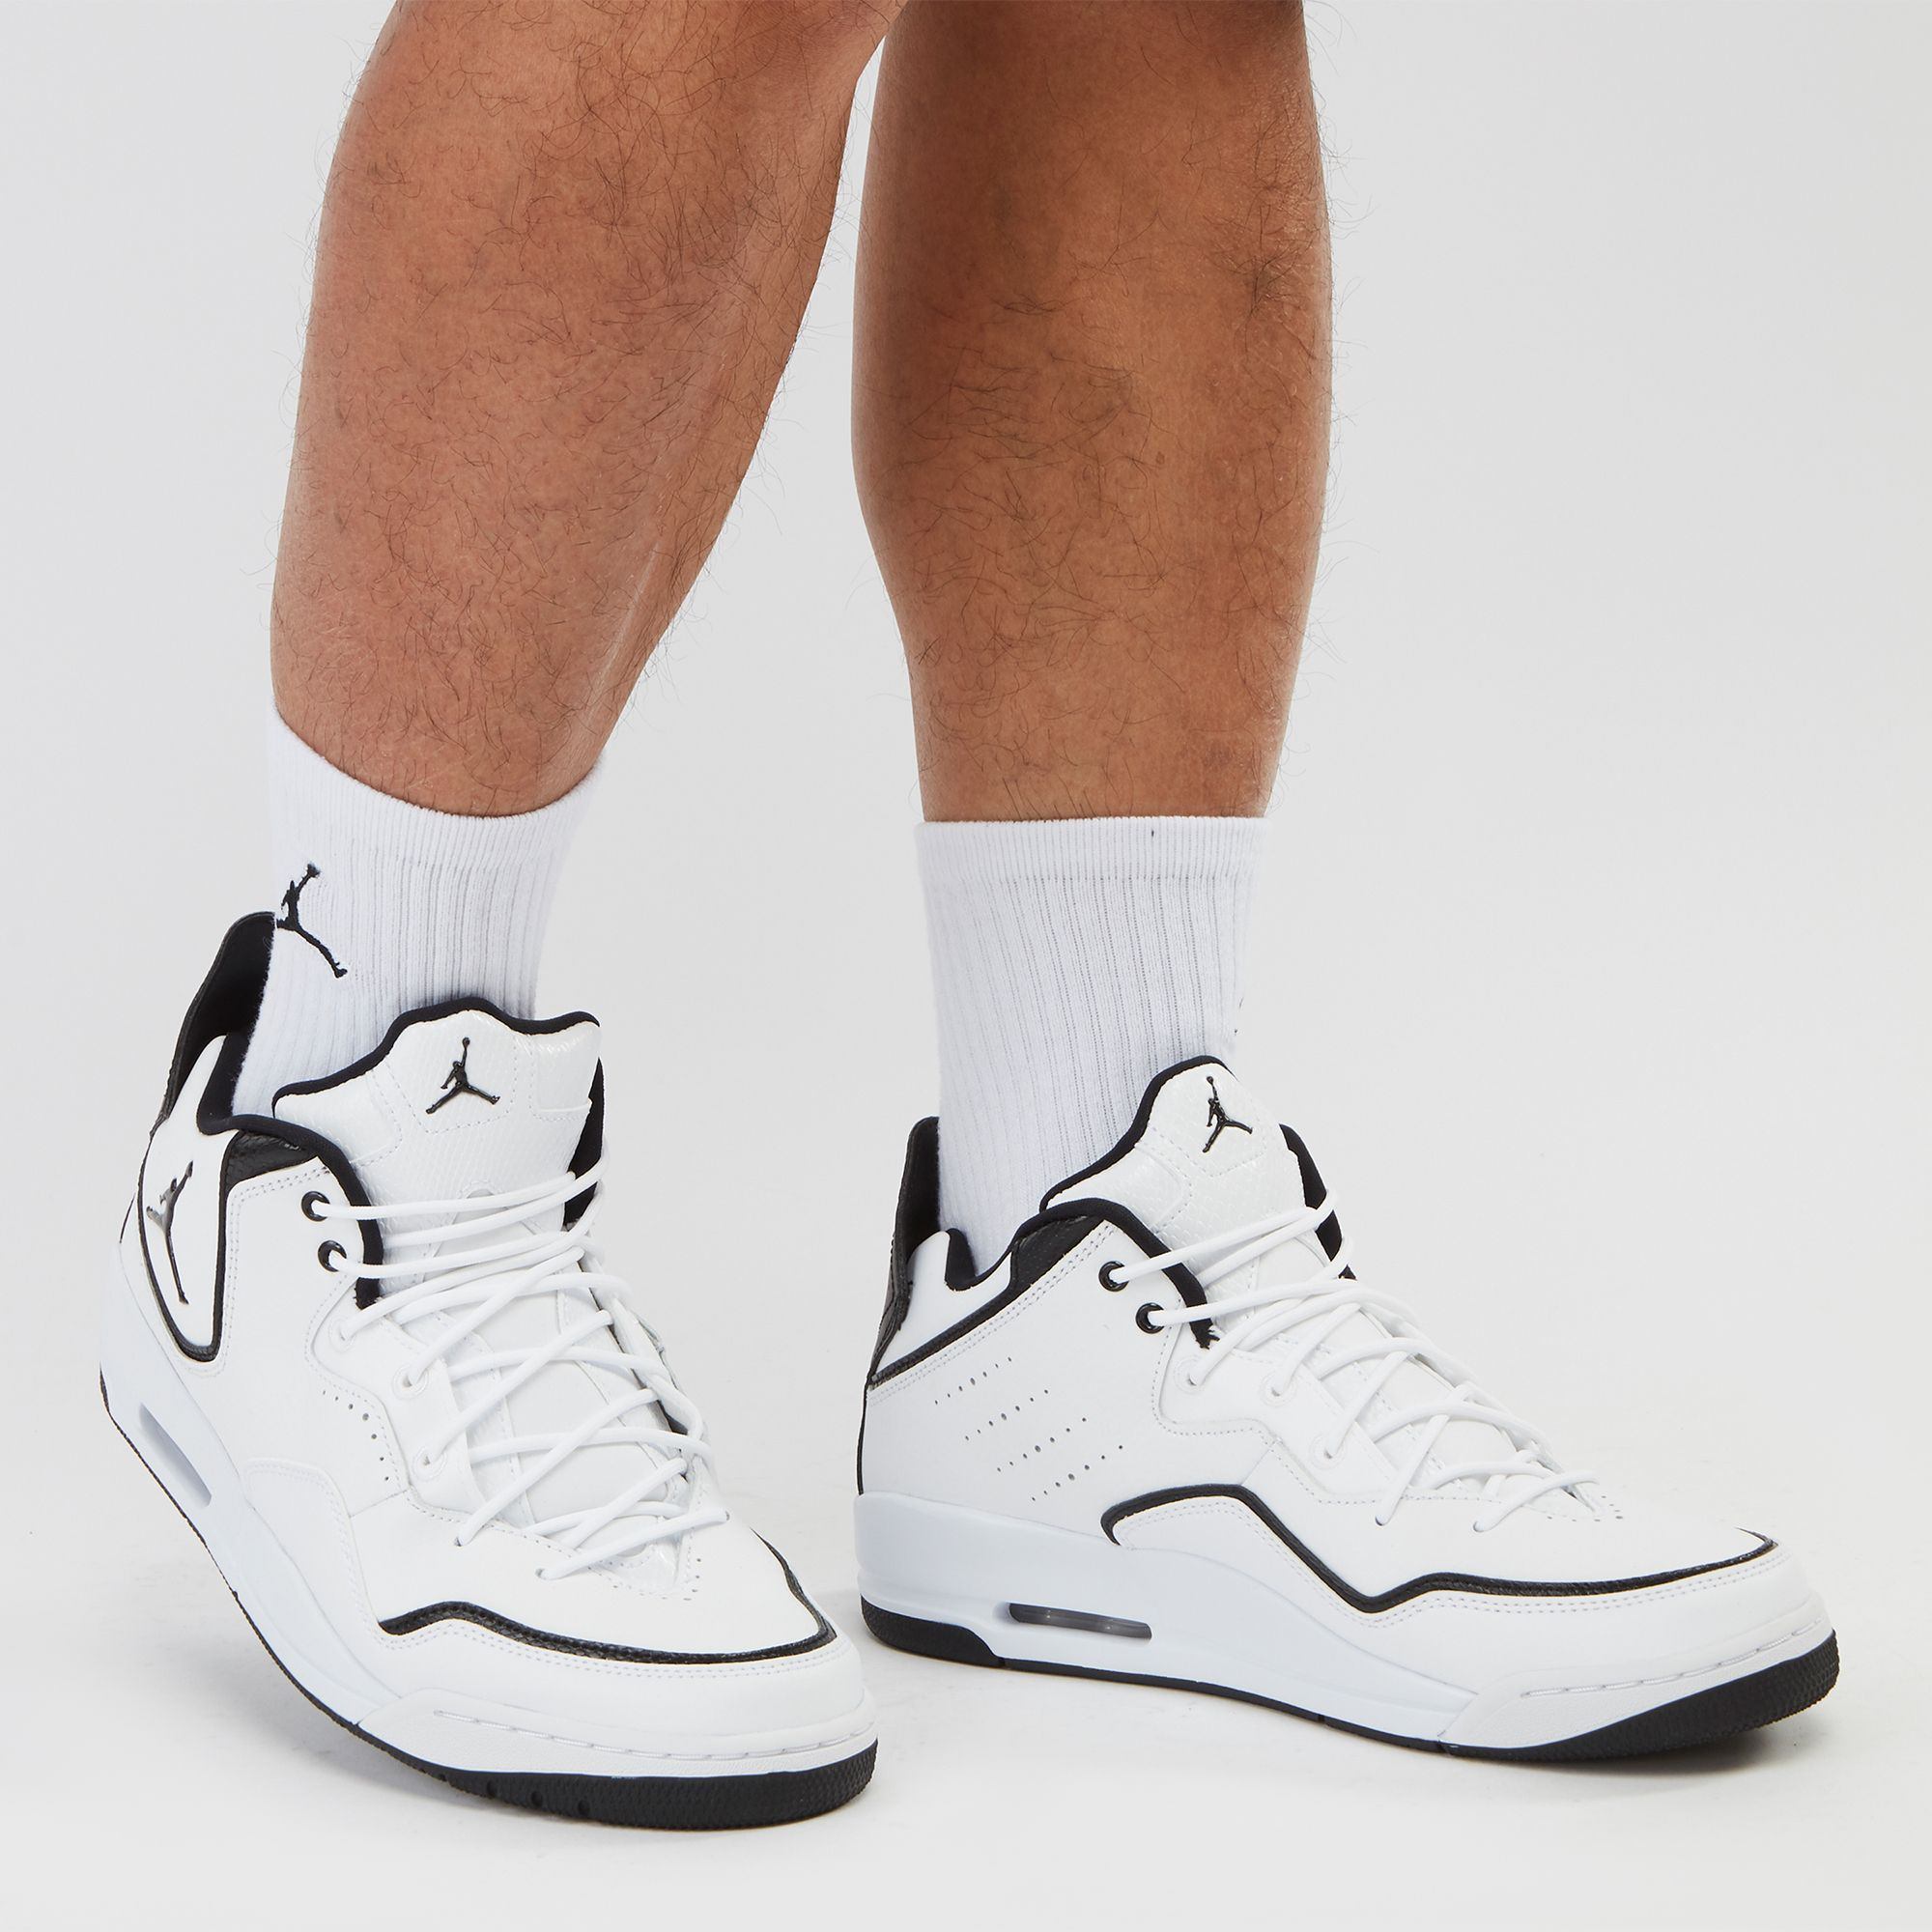 promo code d5168 e427e Jordan Courtside 23 Shoe